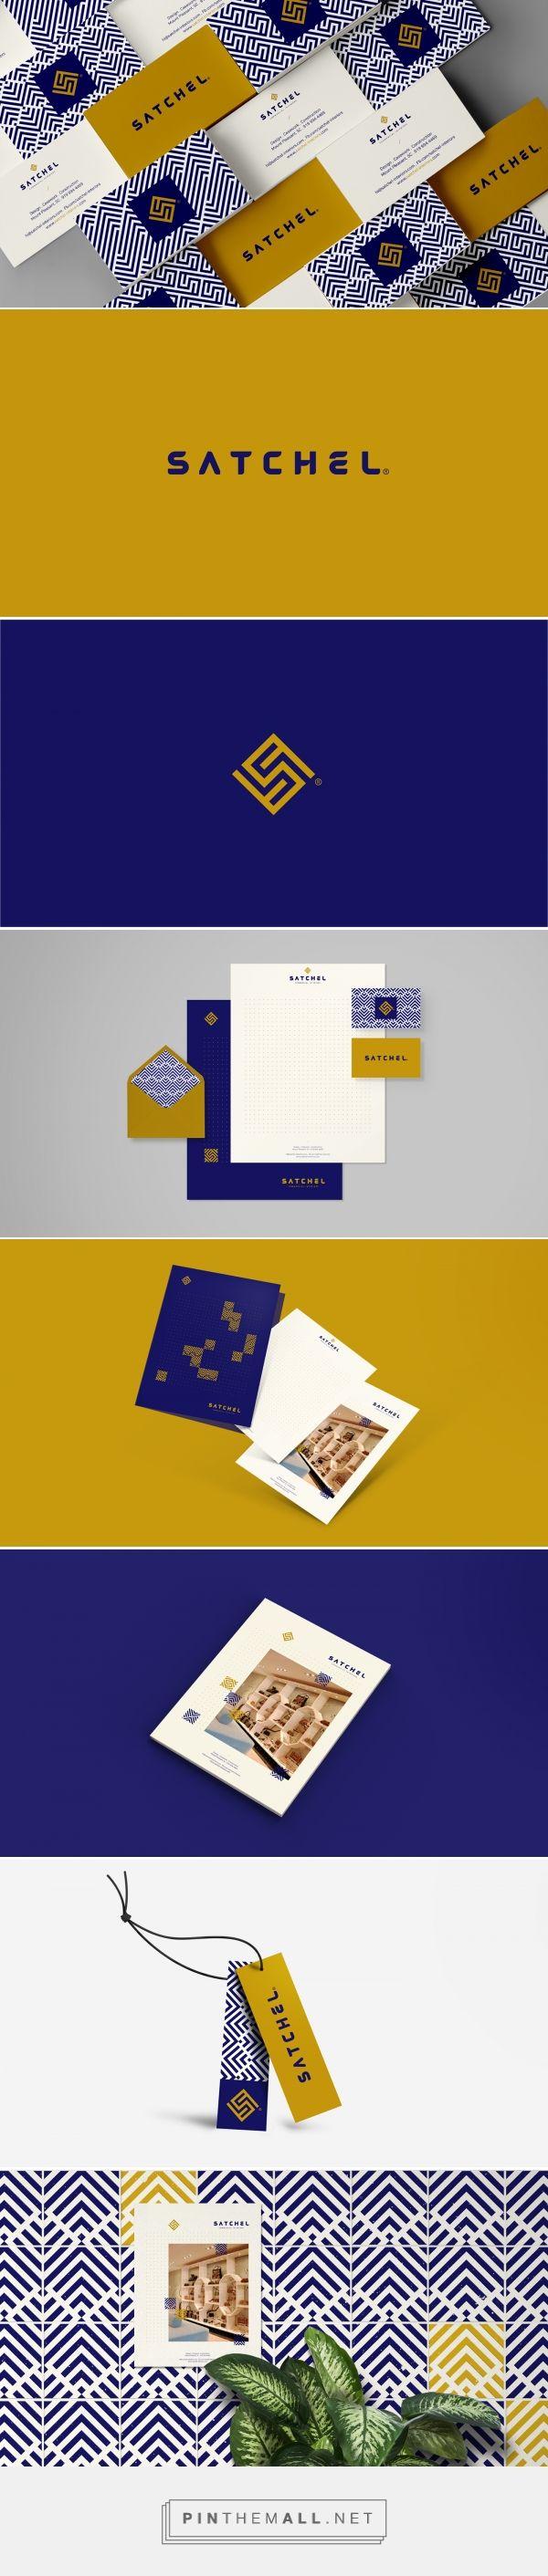 Satchel Interior Design Branding by Roberto Melendrez | Fivestar Branding Agency – Design and Branding Agency & Curated Inspiration Gallery